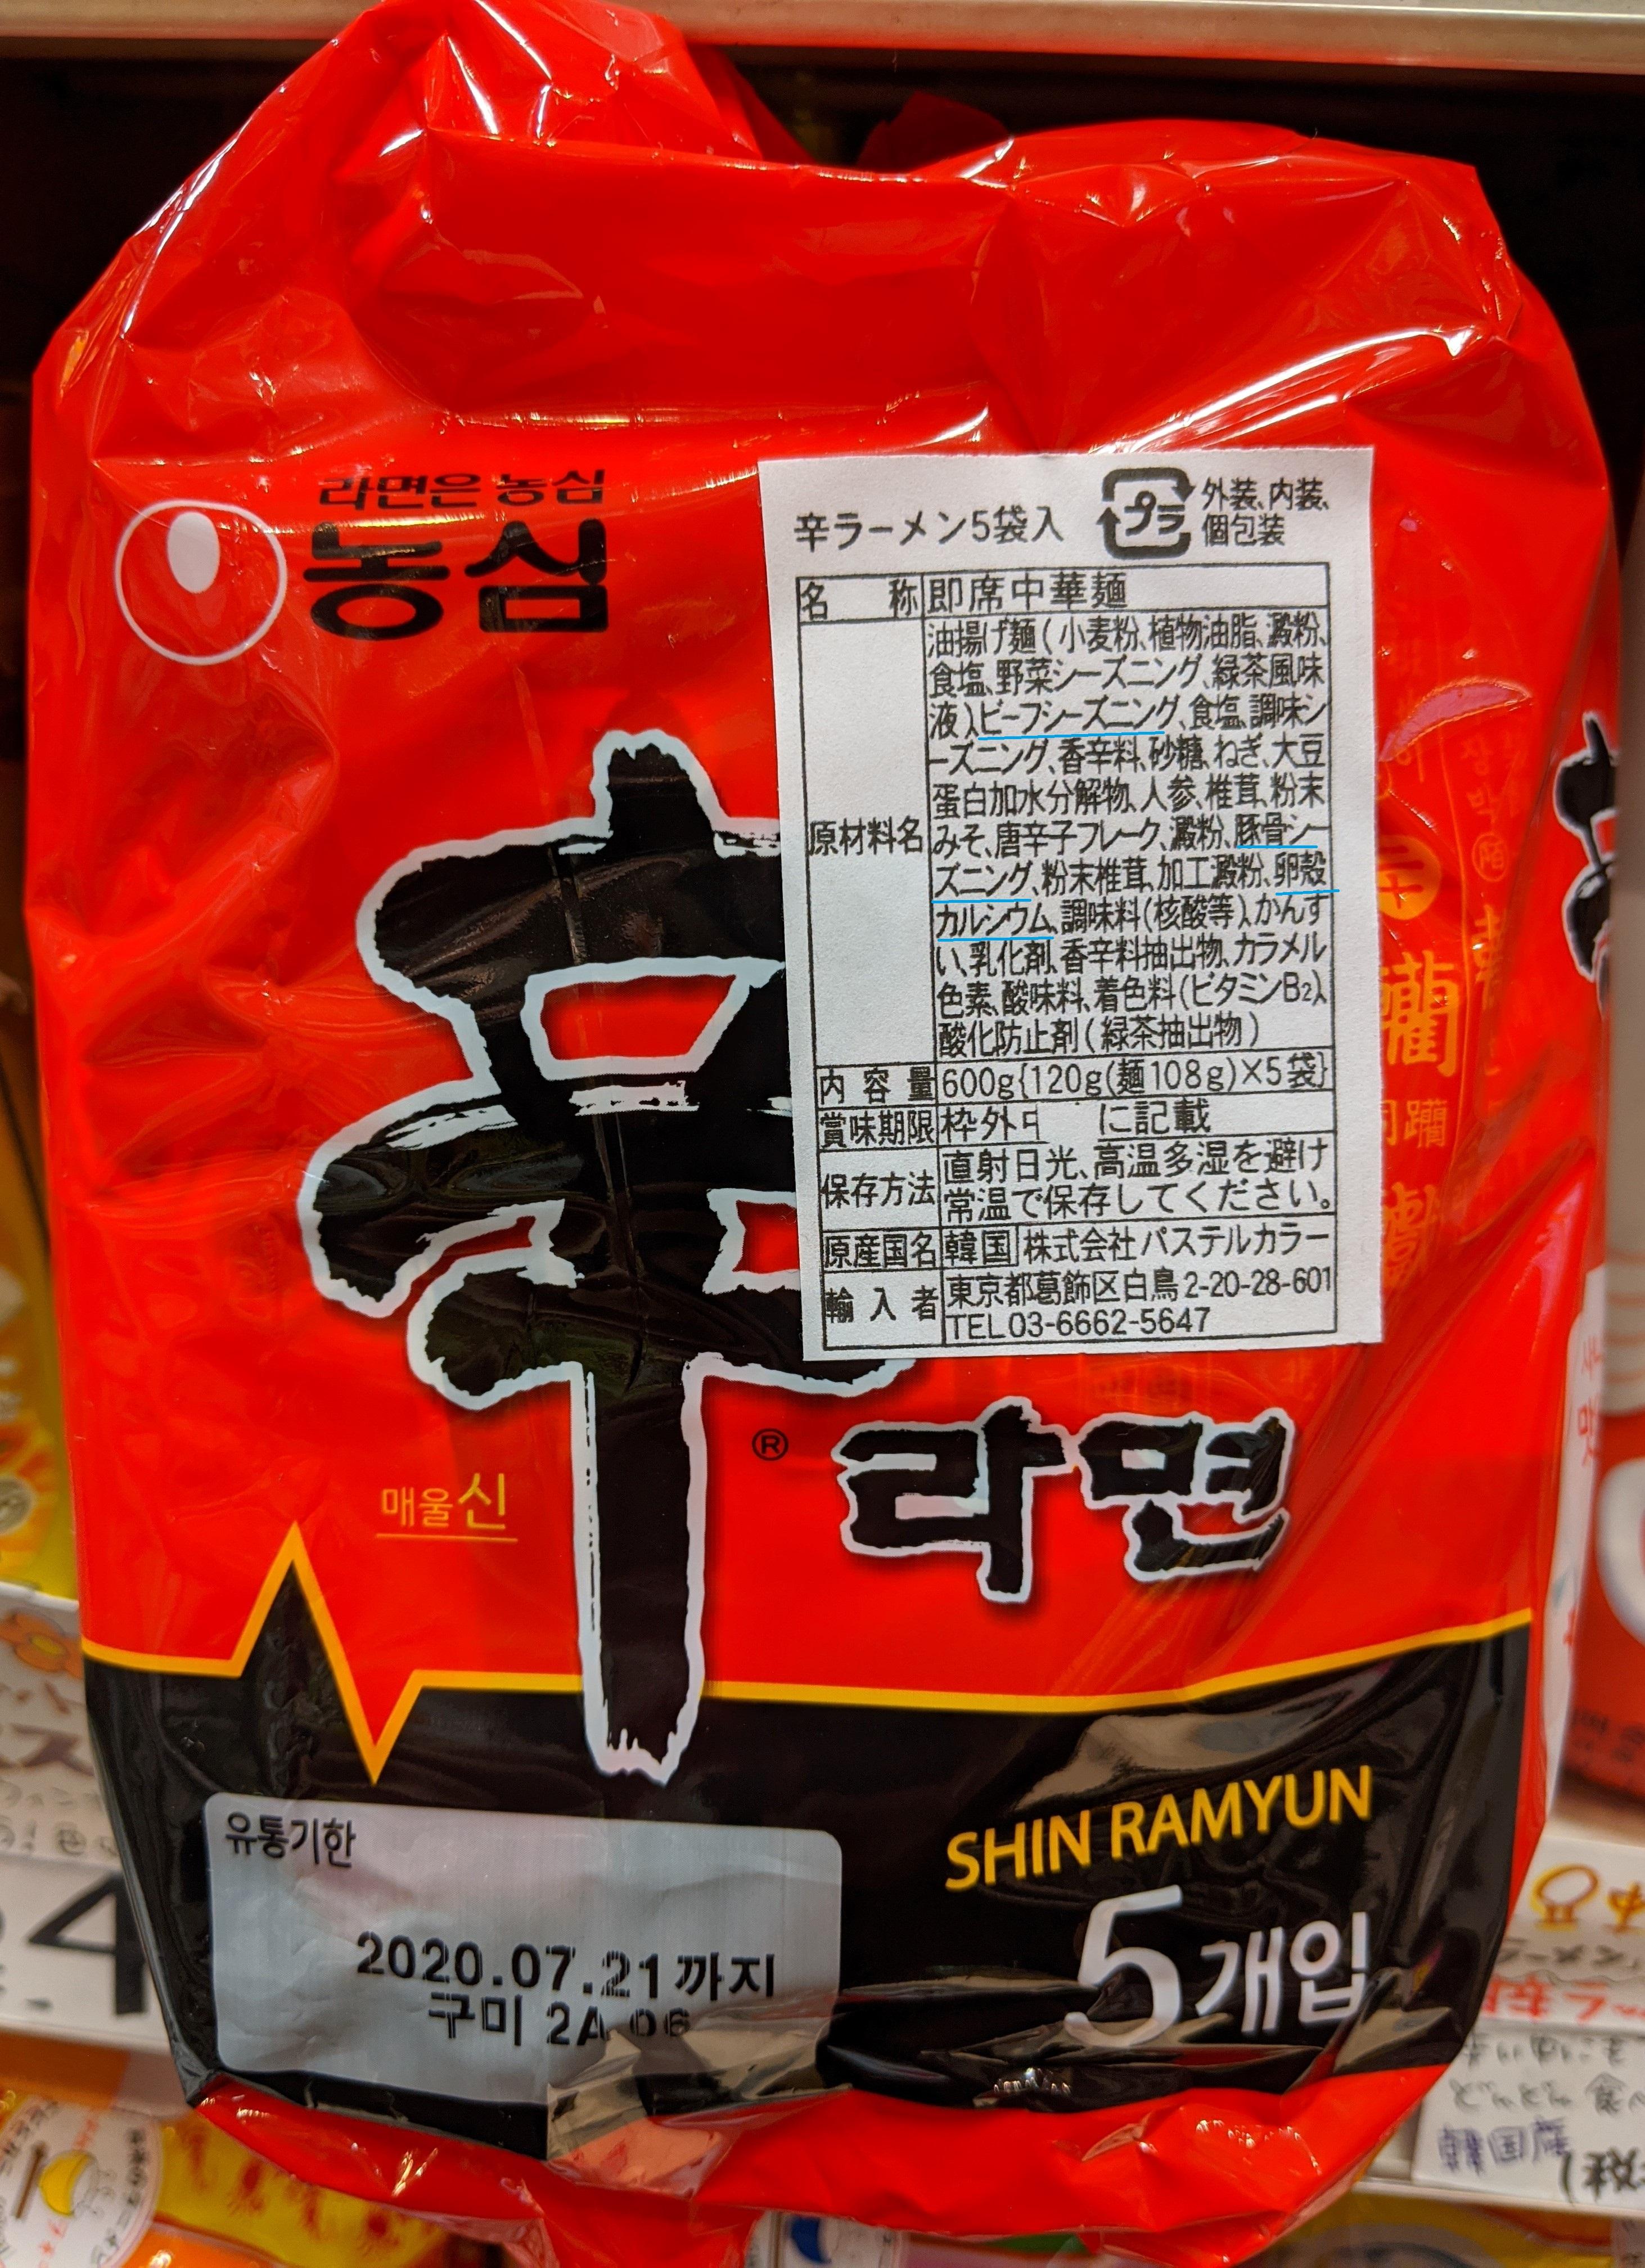 shin ramen made in korea ingredient list